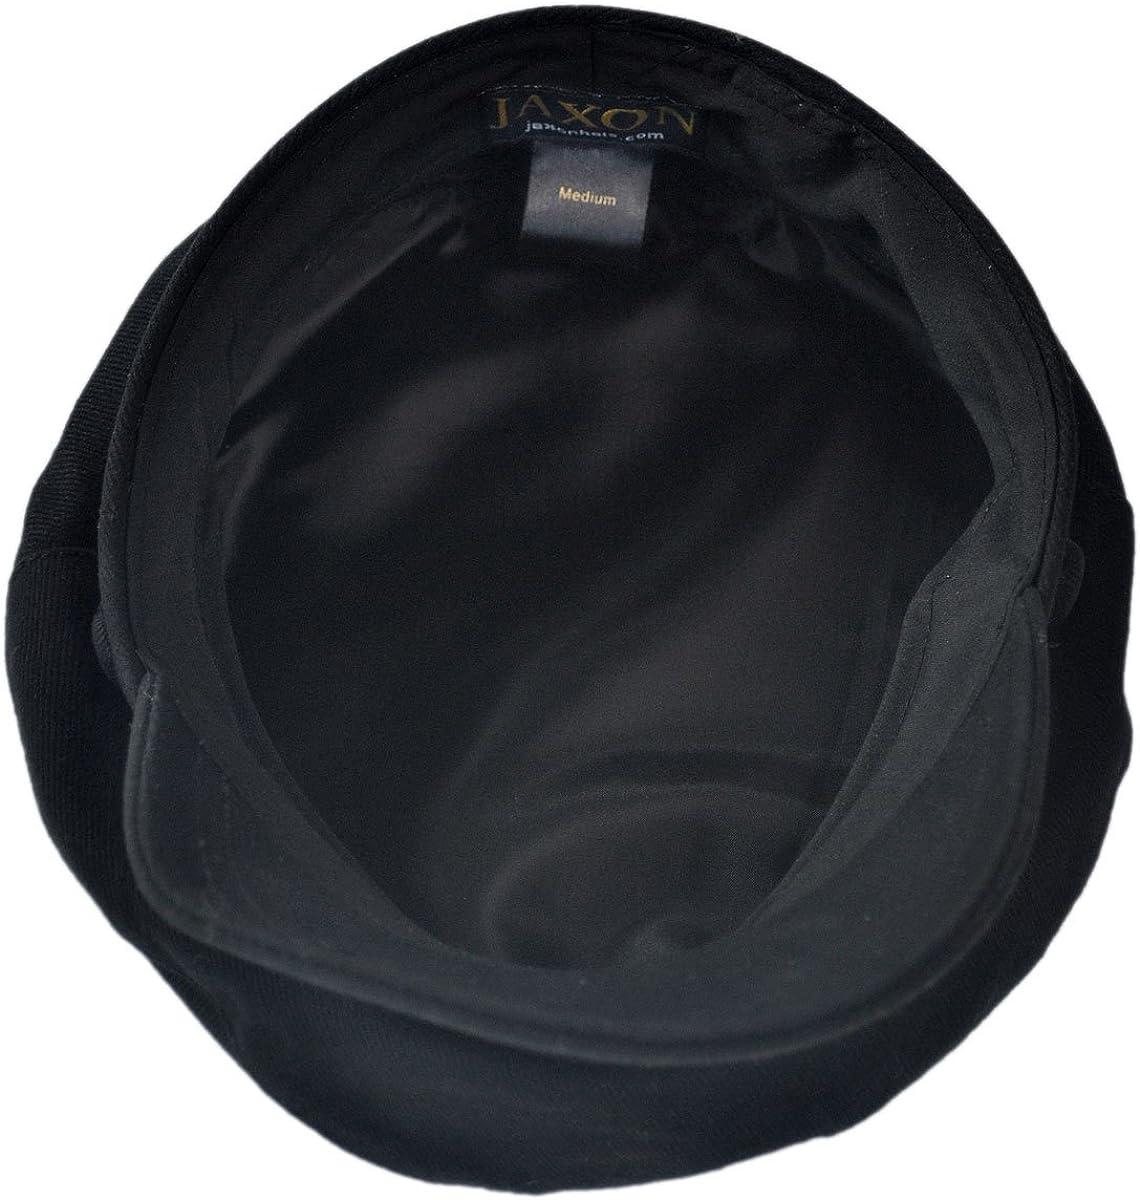 Jaxon Fiddlers Cotton Cap